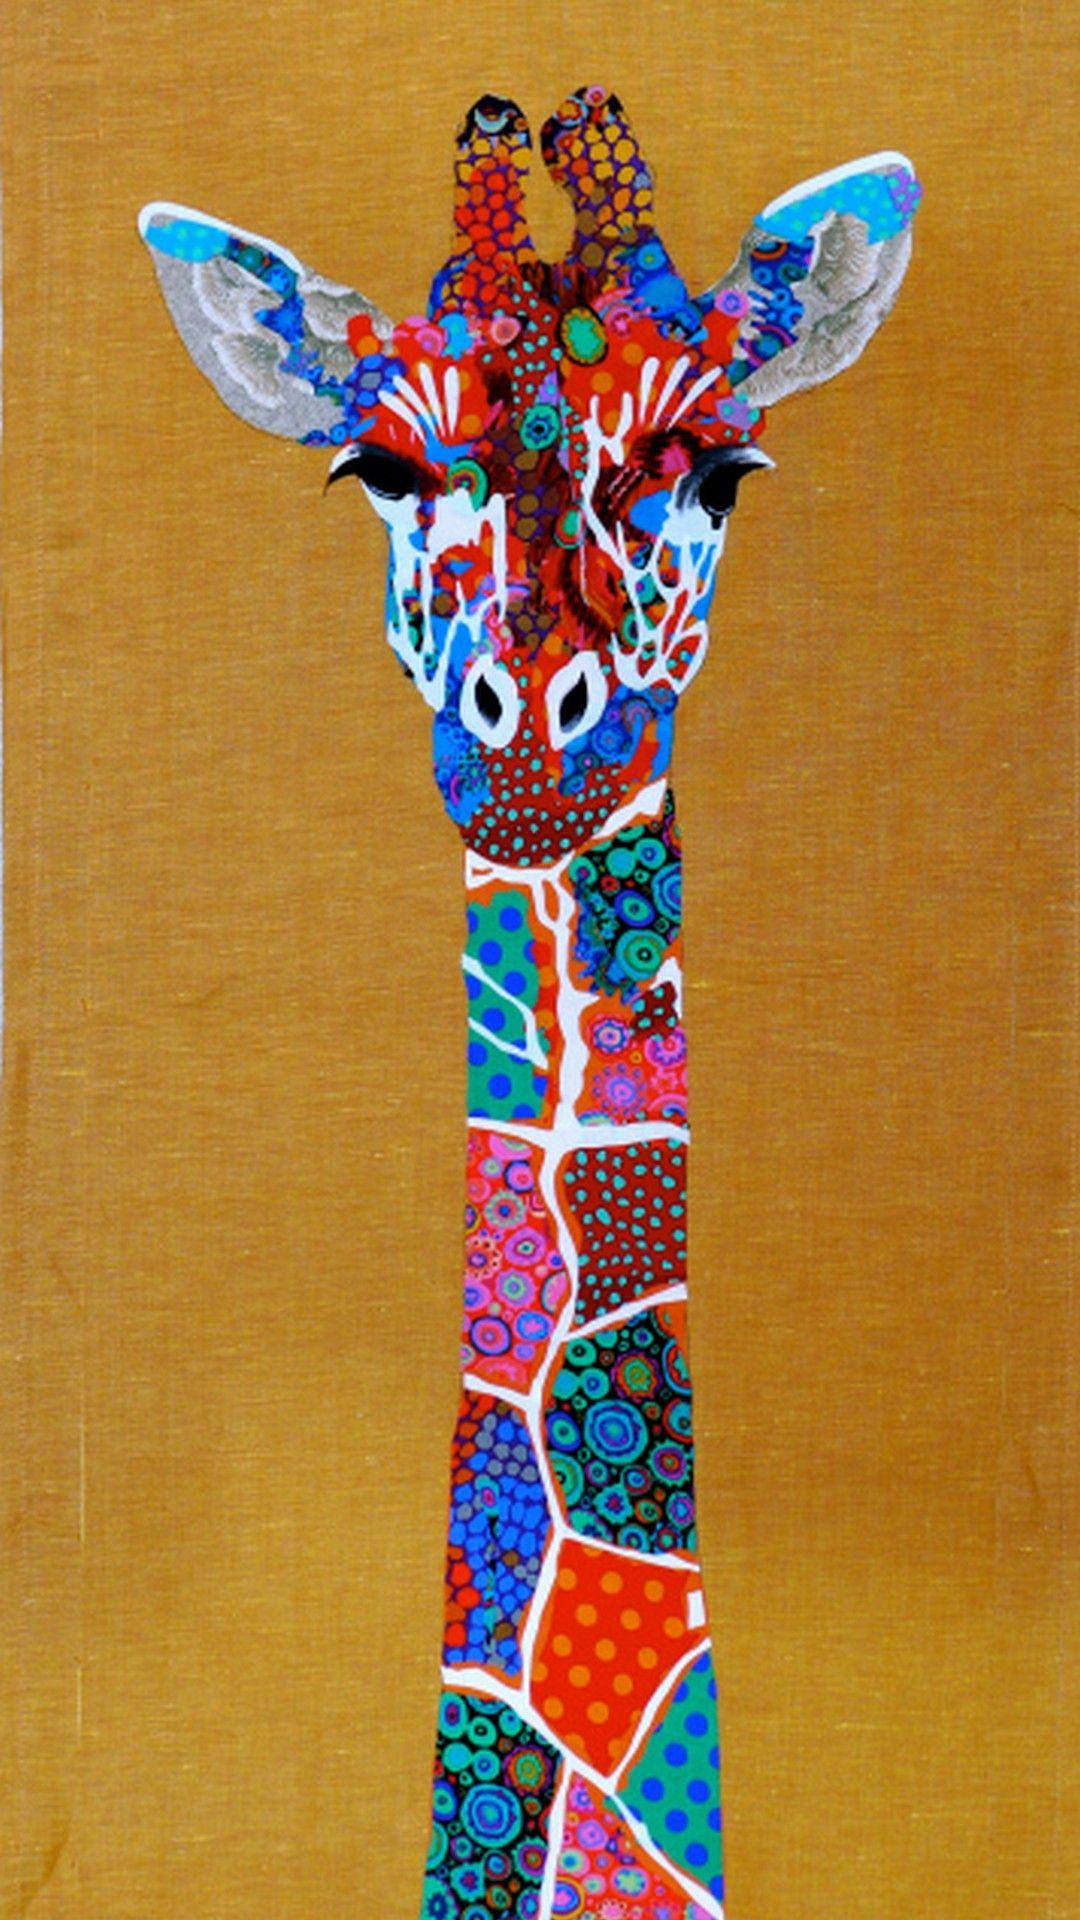 Colorful Giraffe Wallpaper IPhone